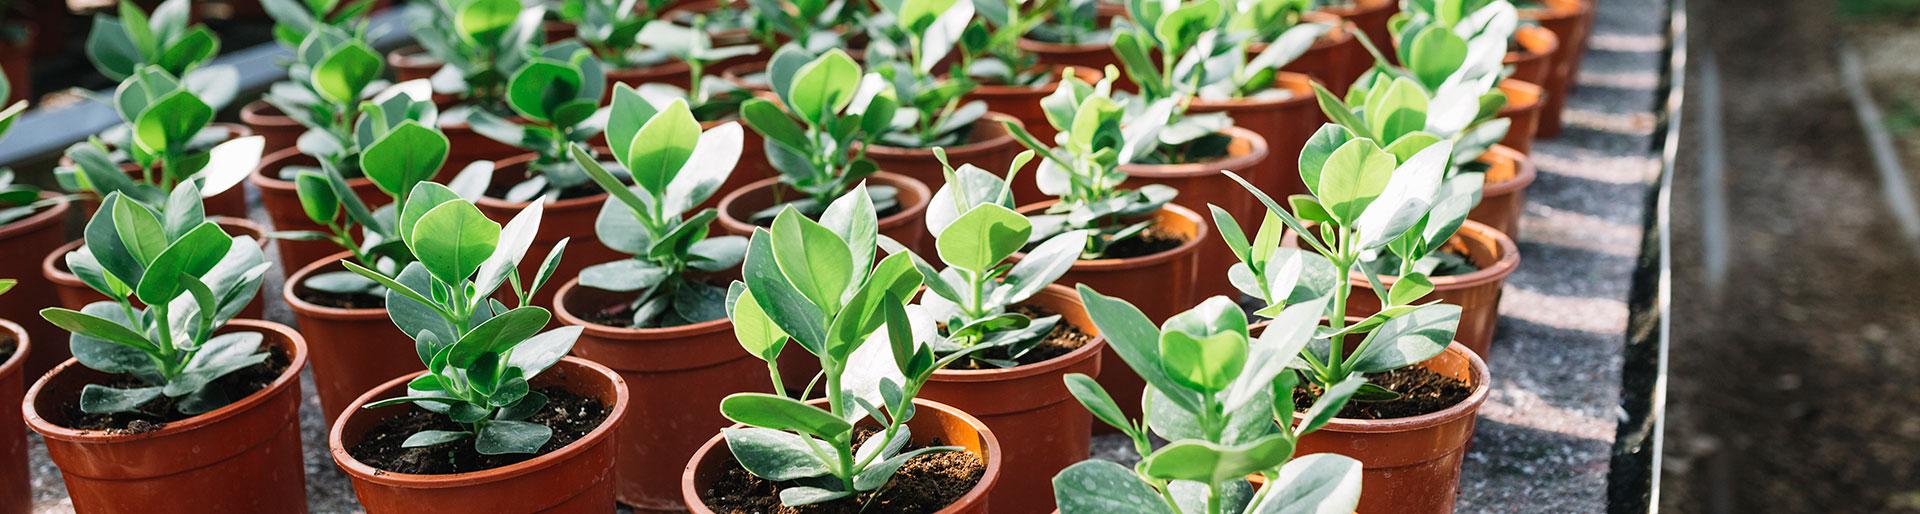 BTSa PH - Plantes en pot serre horticole